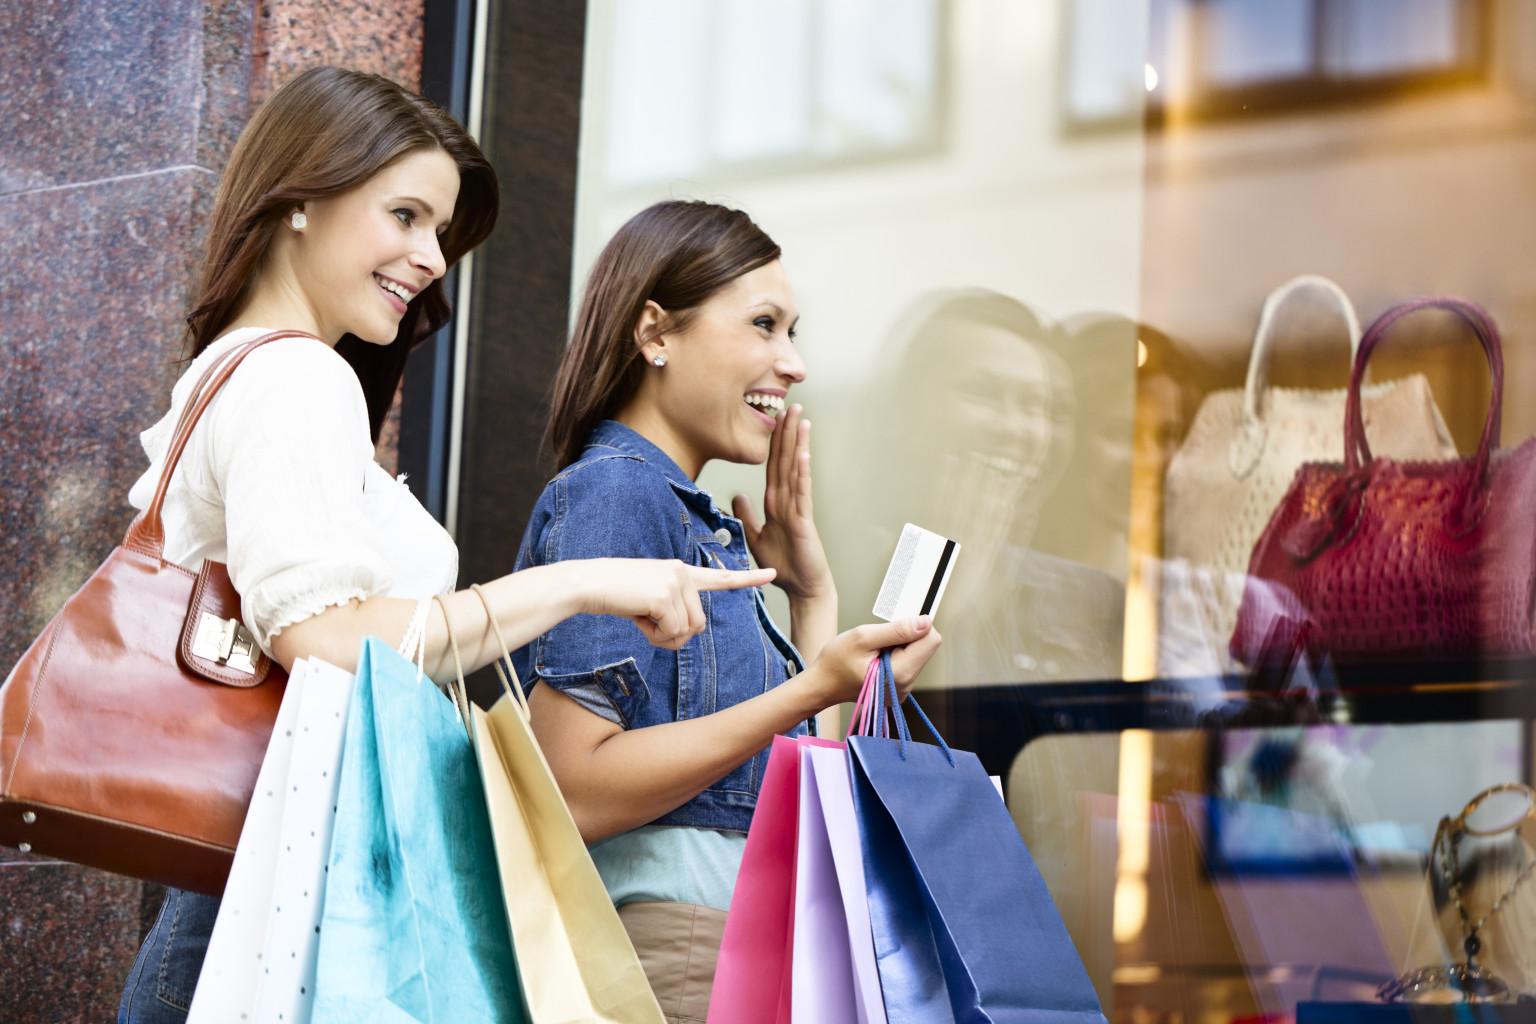 women-and-shopping-addiction.jpg